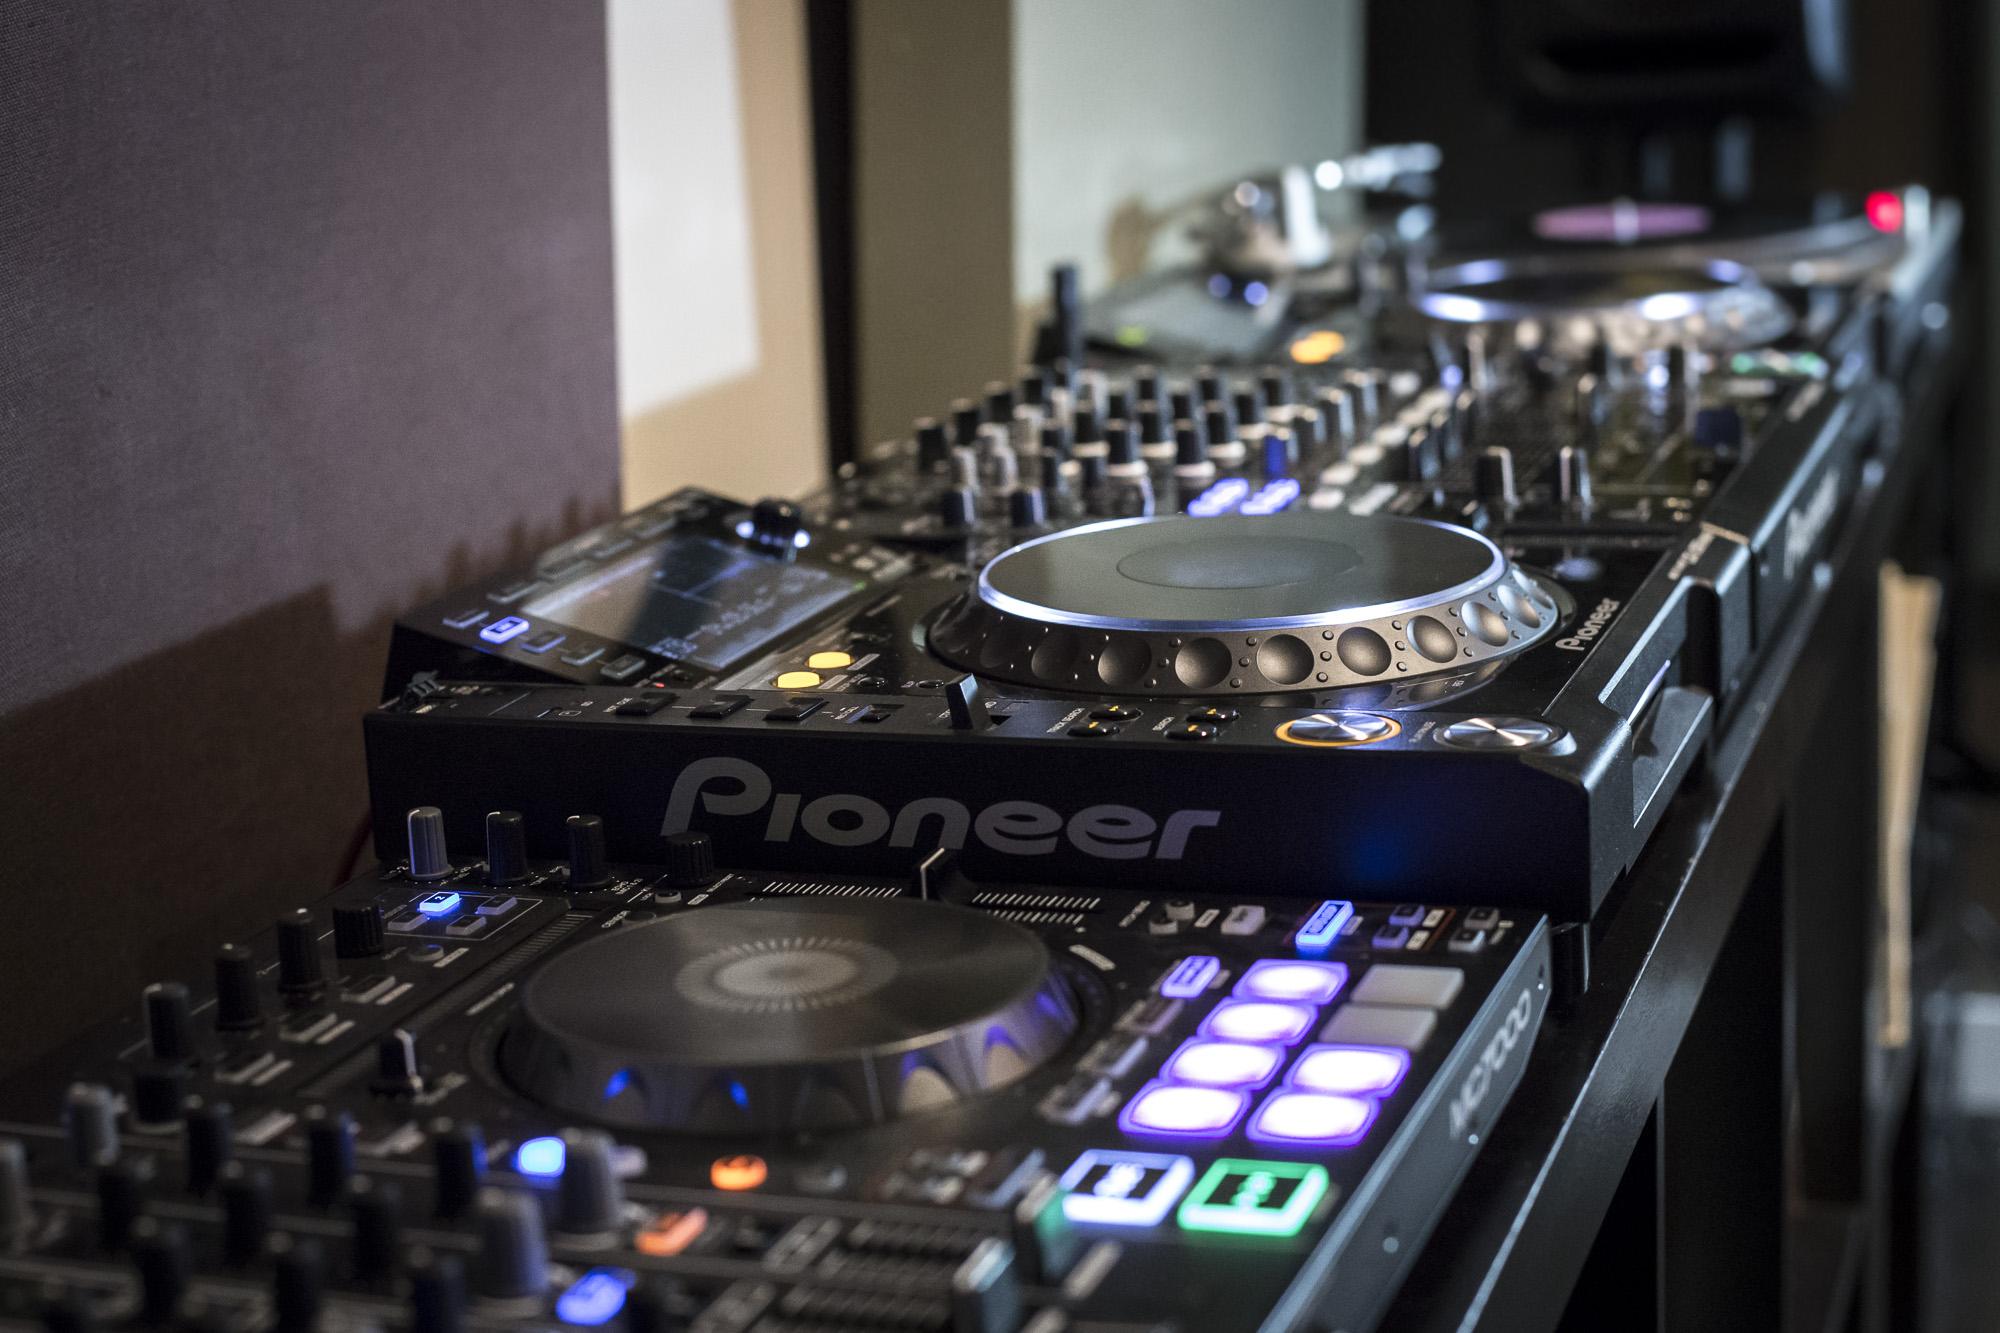 We teach lessons on all platforms: CDJS, DJ controllers, Turntables, Serato, Rekordbox, Traktor